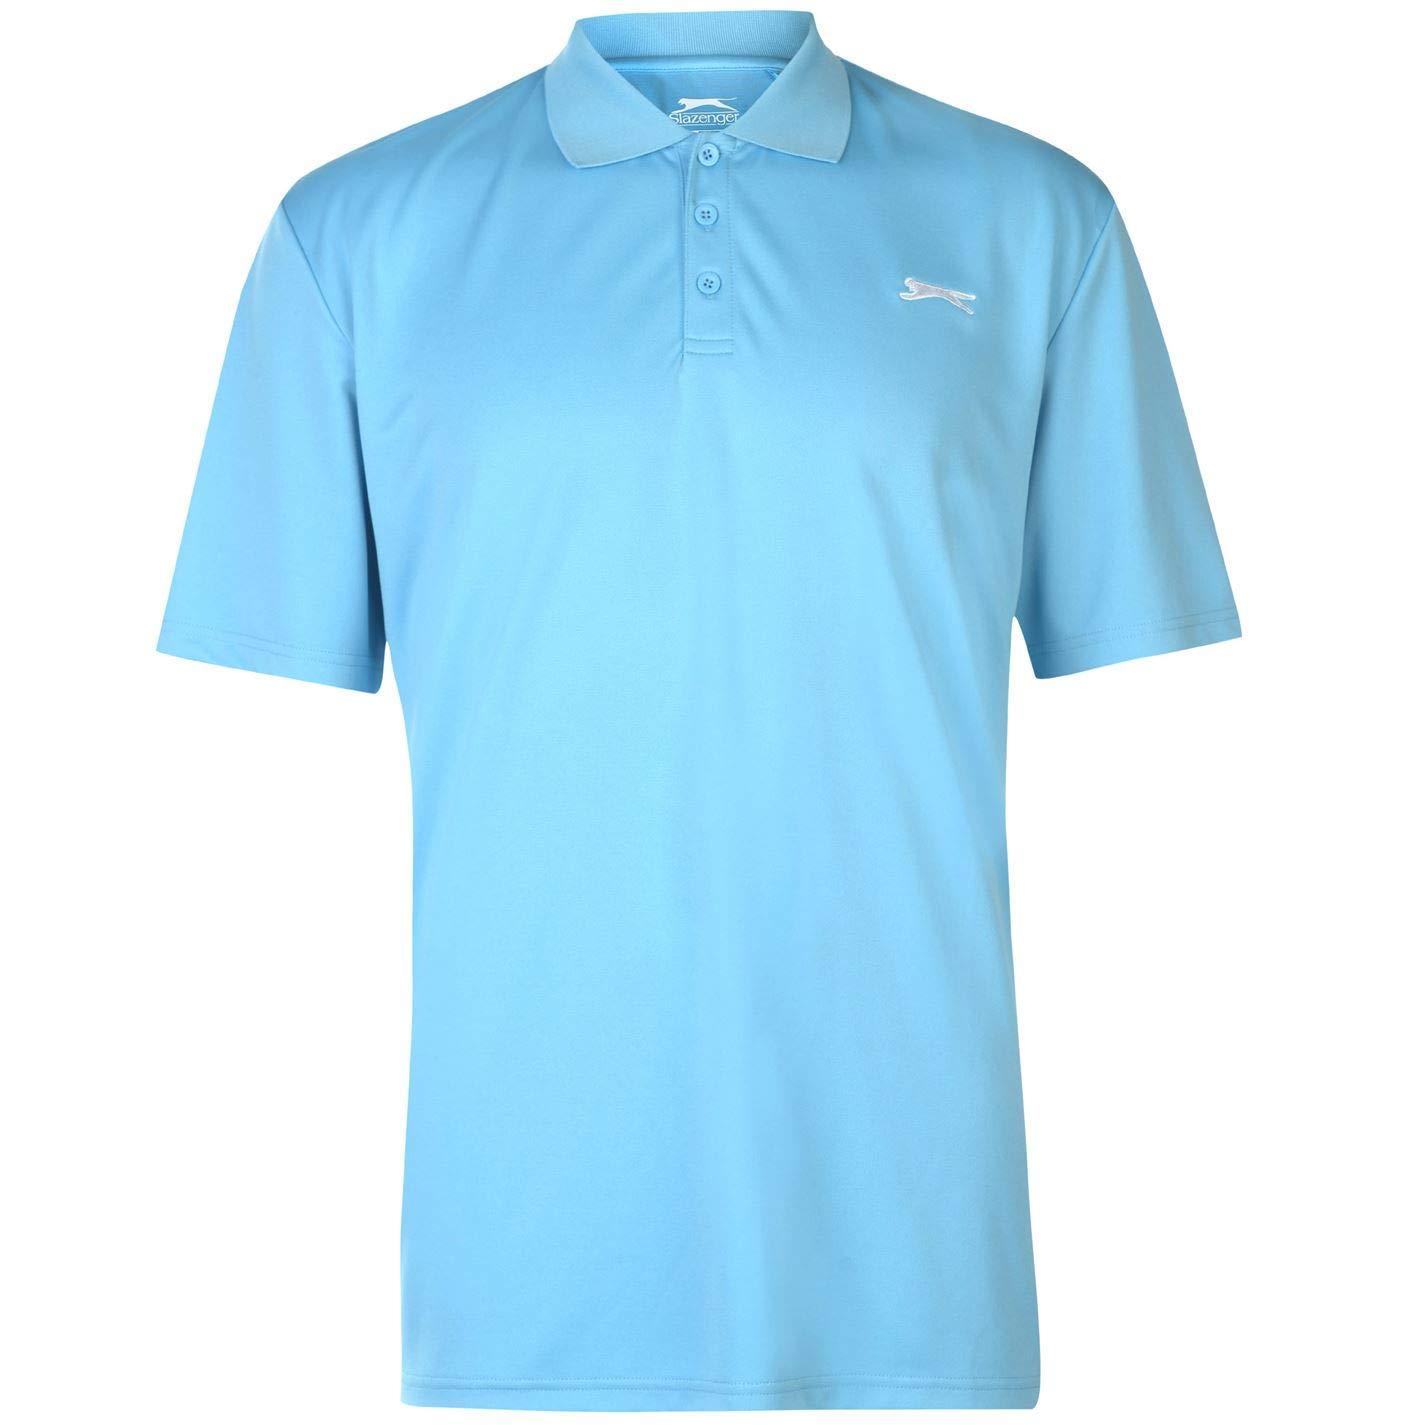 Slazenger - Camiseta de Manga Corta para Hombre Azul Agua L ...